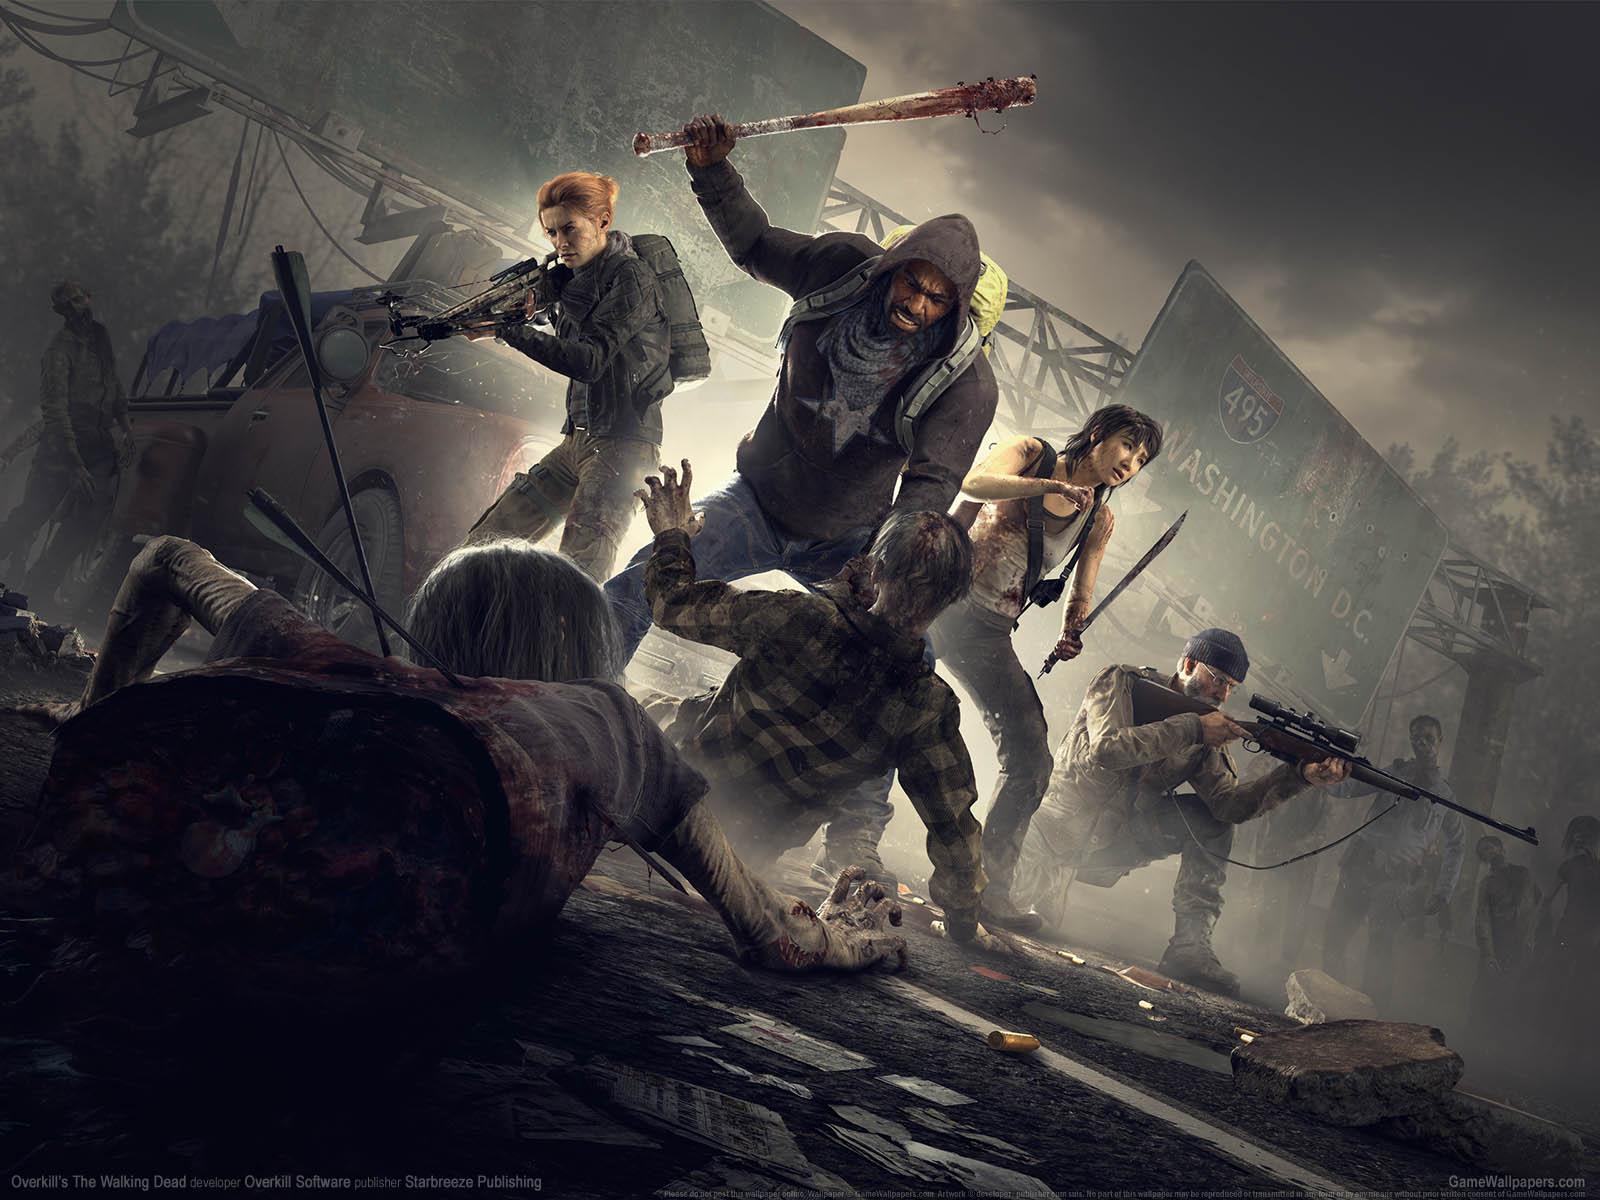 Overkill's The Walking Deadνmmer=01 Hintergrundbild  1600x1200